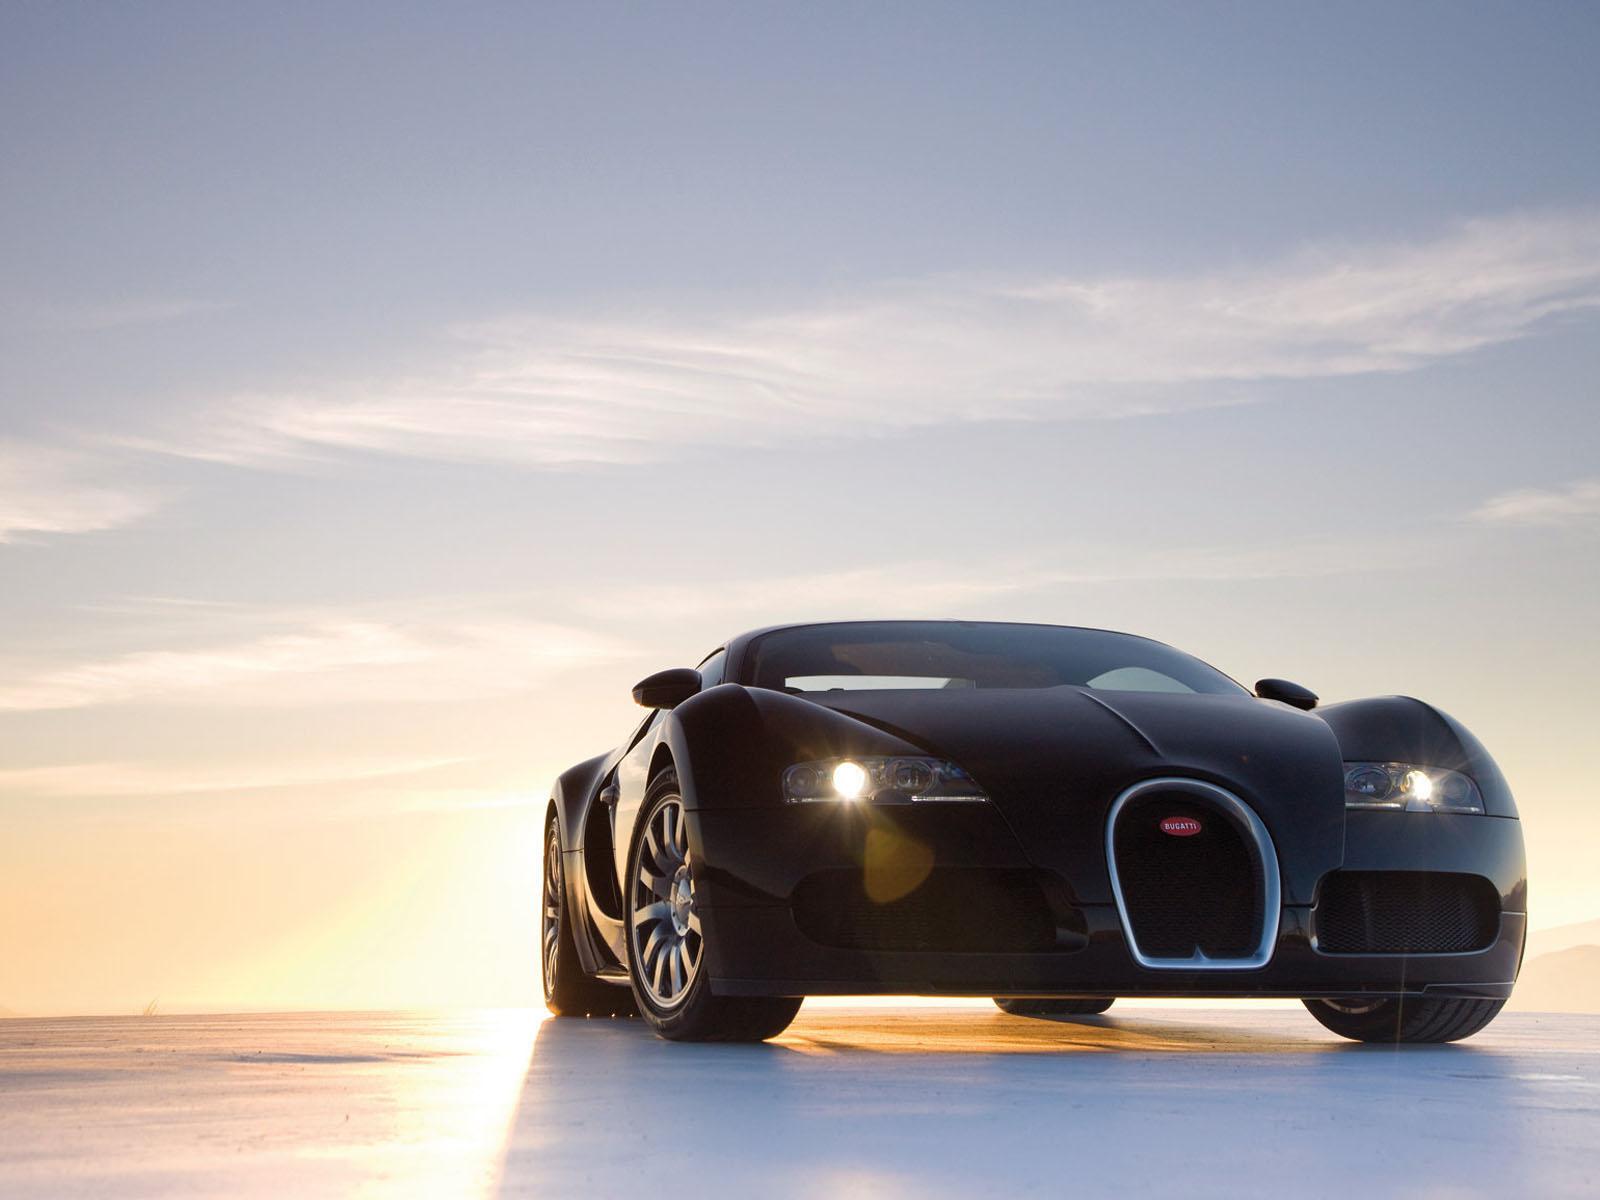 Bugatti Veyron Wallpaper 13 HD